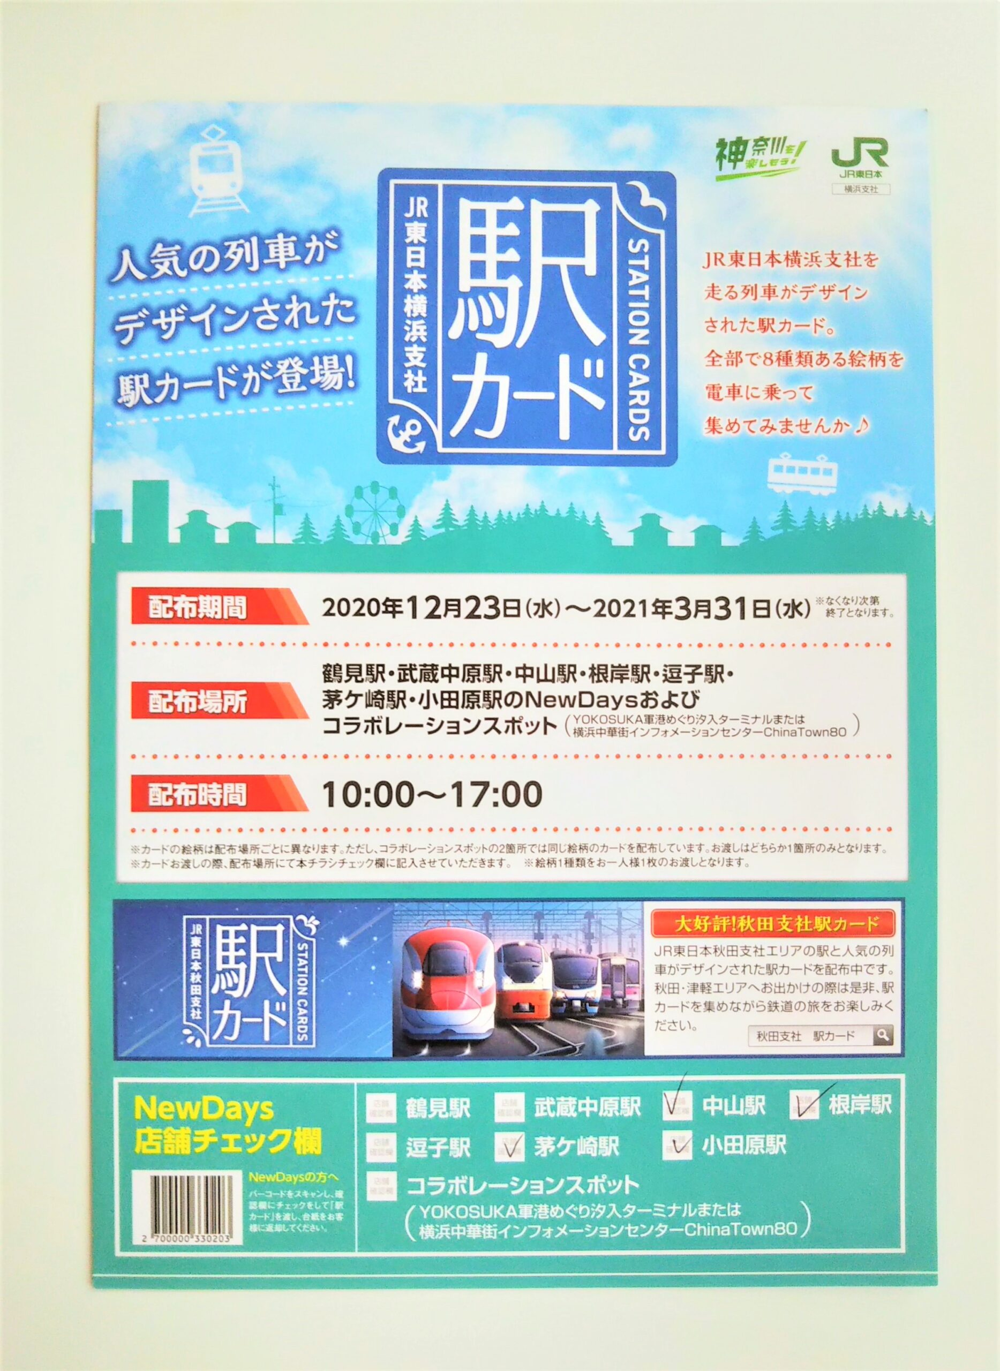 JR東日本横浜支社エリア駅カードのパンフレット